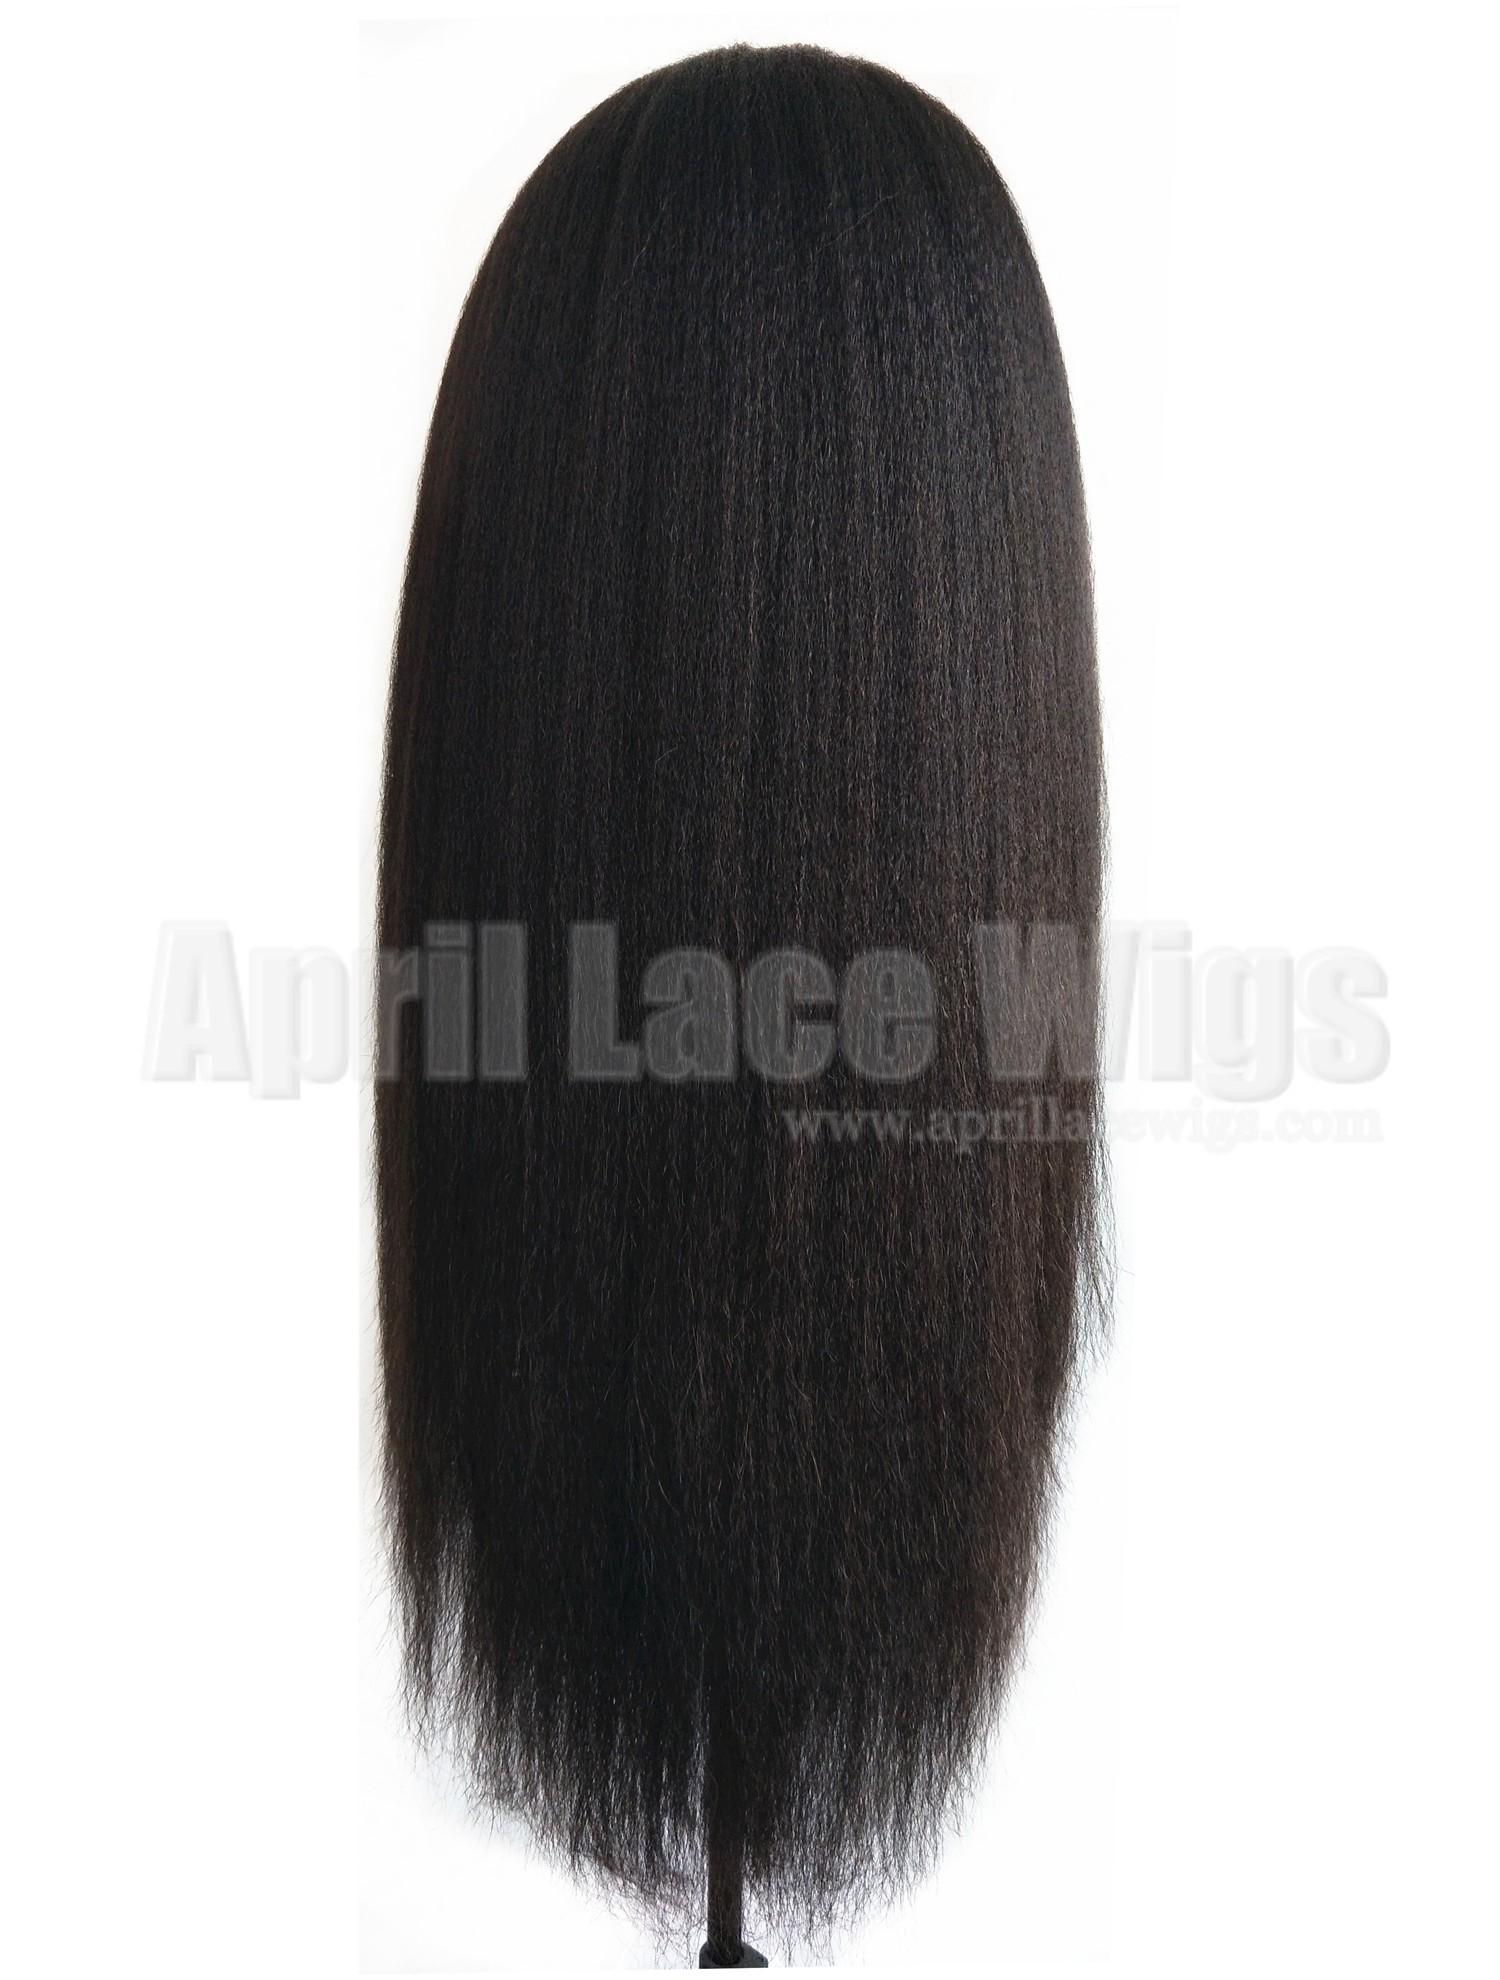 150% density italian yaki glueless full lace cap with silk top on sale